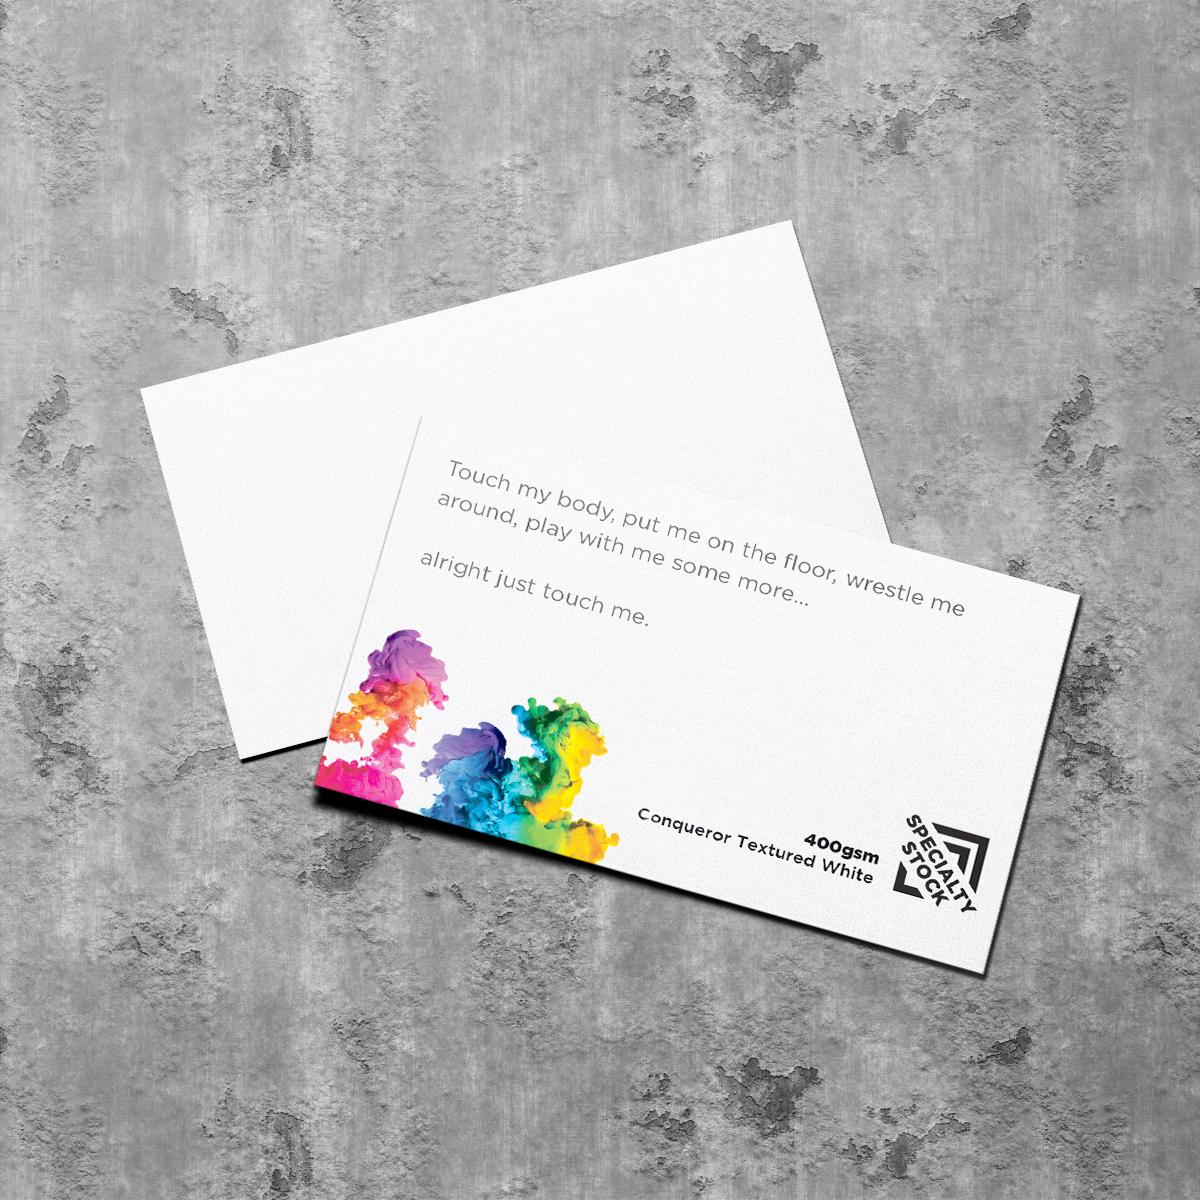 400gsm textured Business Card Conqueror